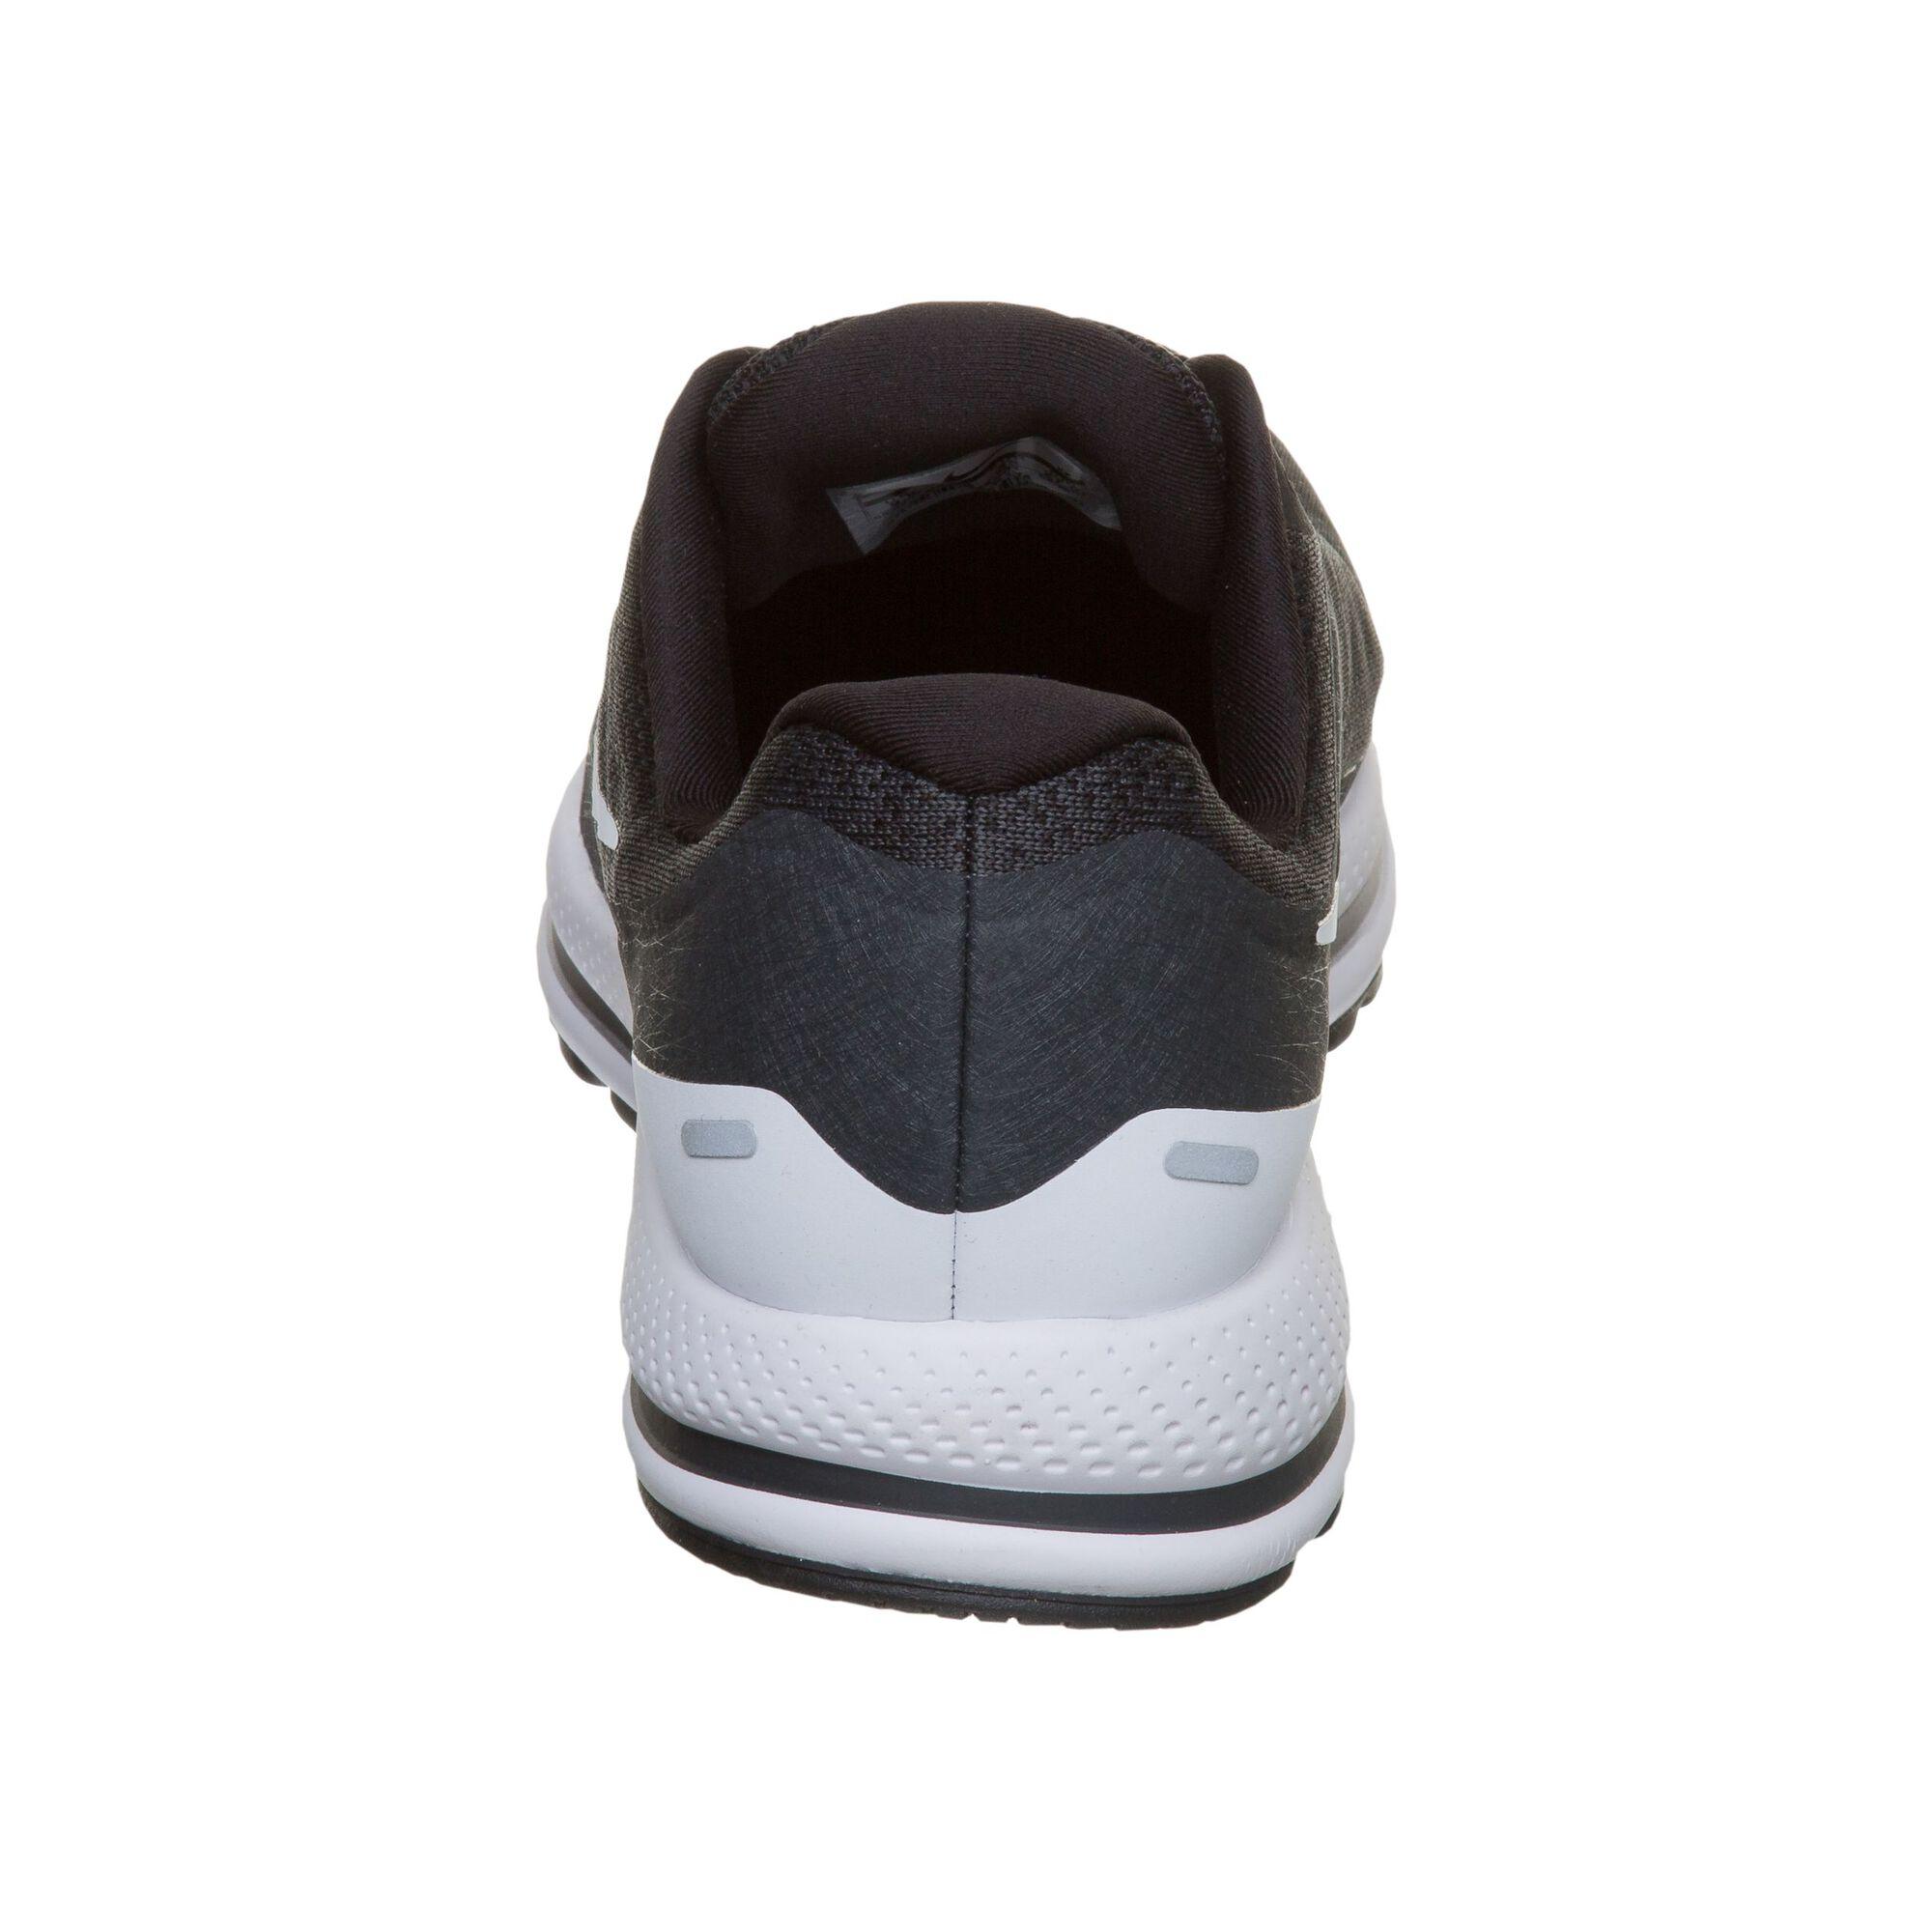 daeb801ee0f Nike  Nike  Nike  Nike  Nike  Nike  Nike  Nike  Nike  Nike. Air Zoom Vomero  13 Men ...